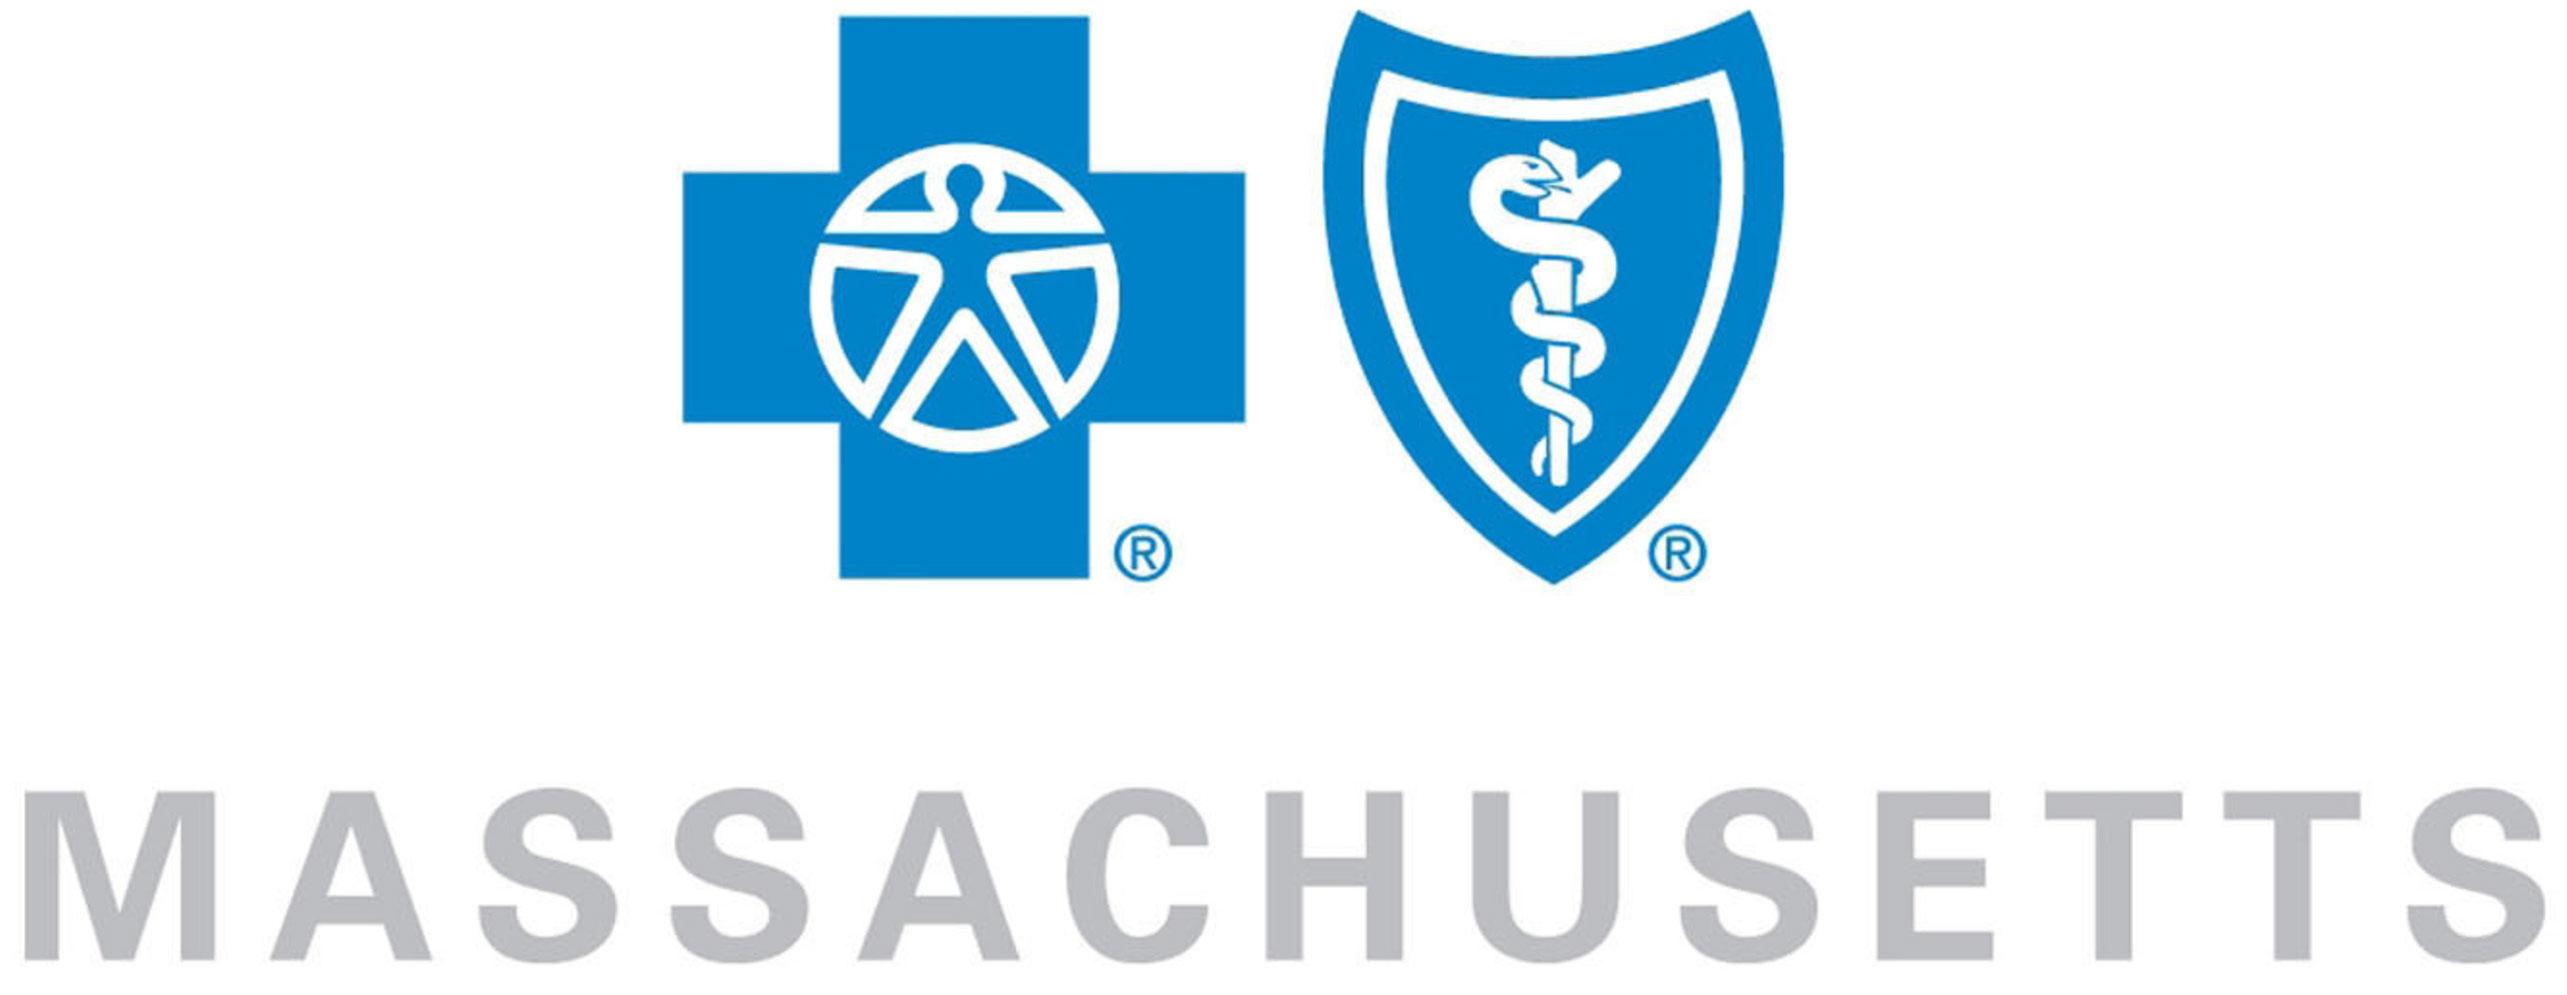 BlueCross BlueShield MA logo